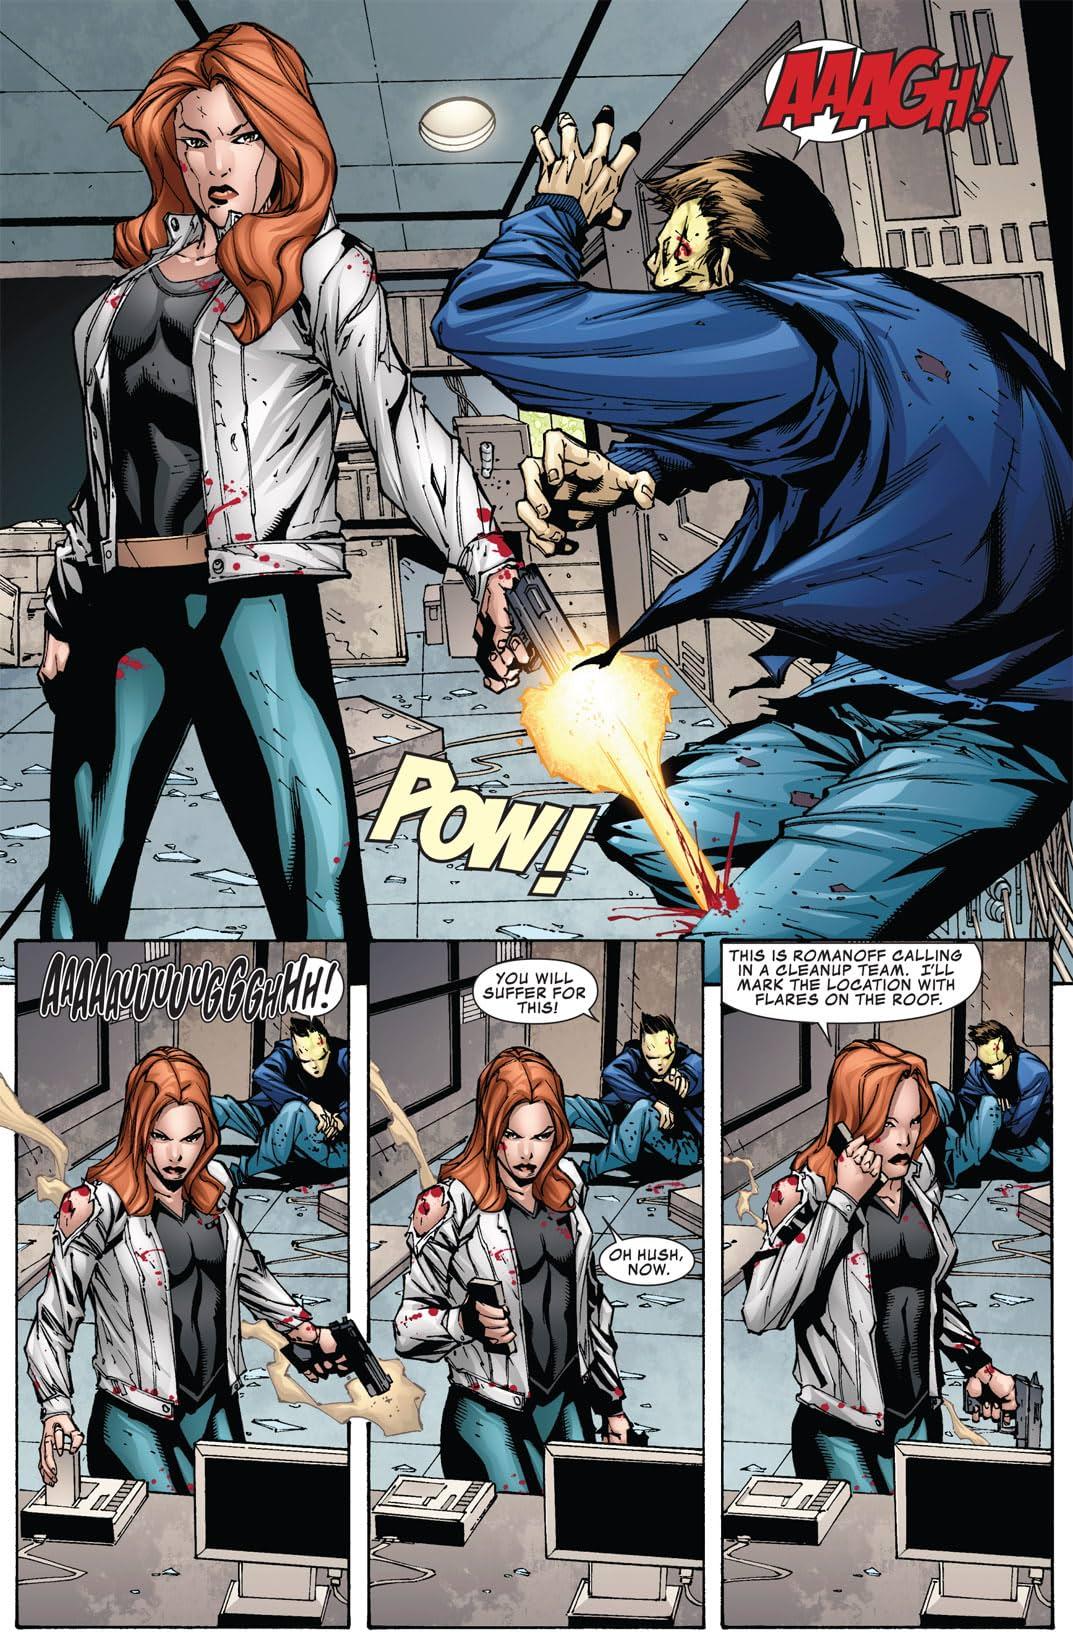 Marvel's The Avengers Prelude: Fury's Big Week #7 (of 8)